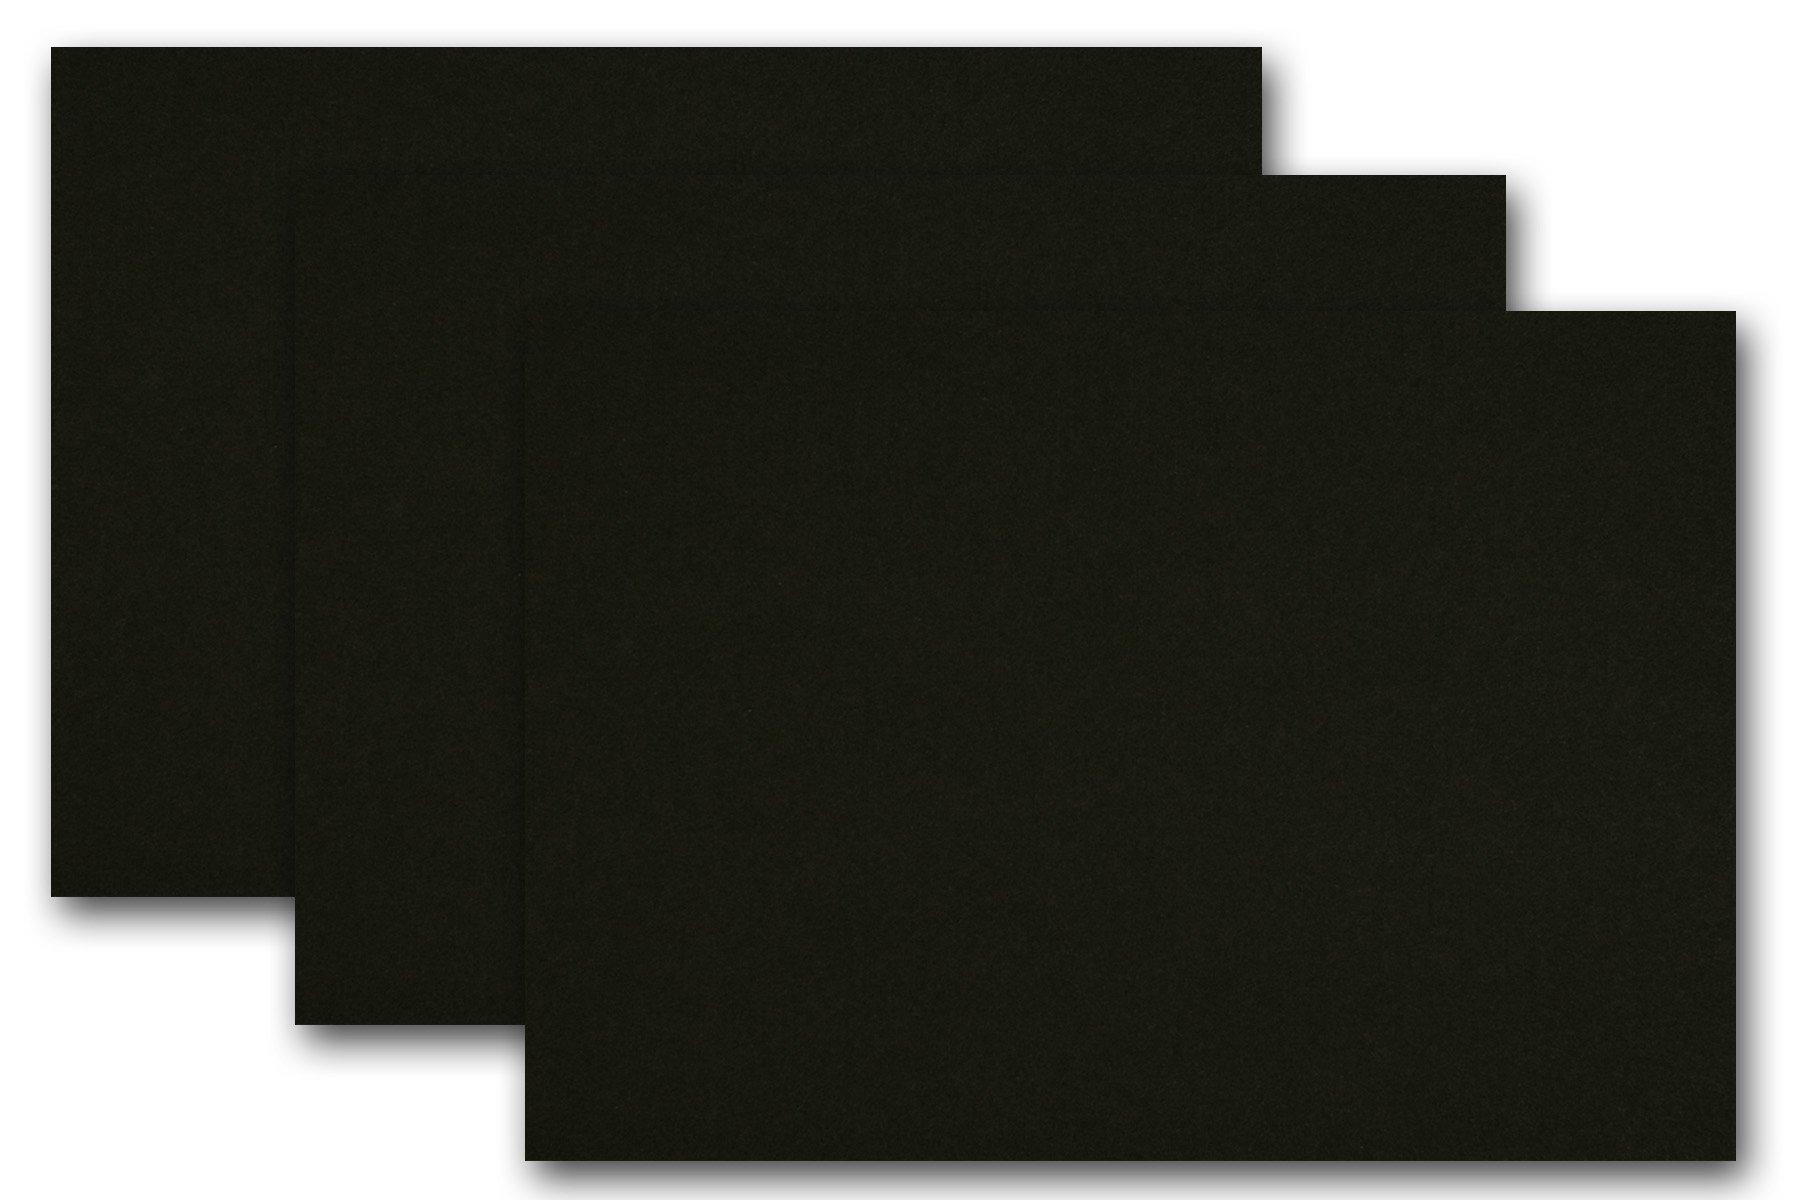 Premium Colored Blank 5x7 Card Stock (250, Black Licorice) by CutCardStock